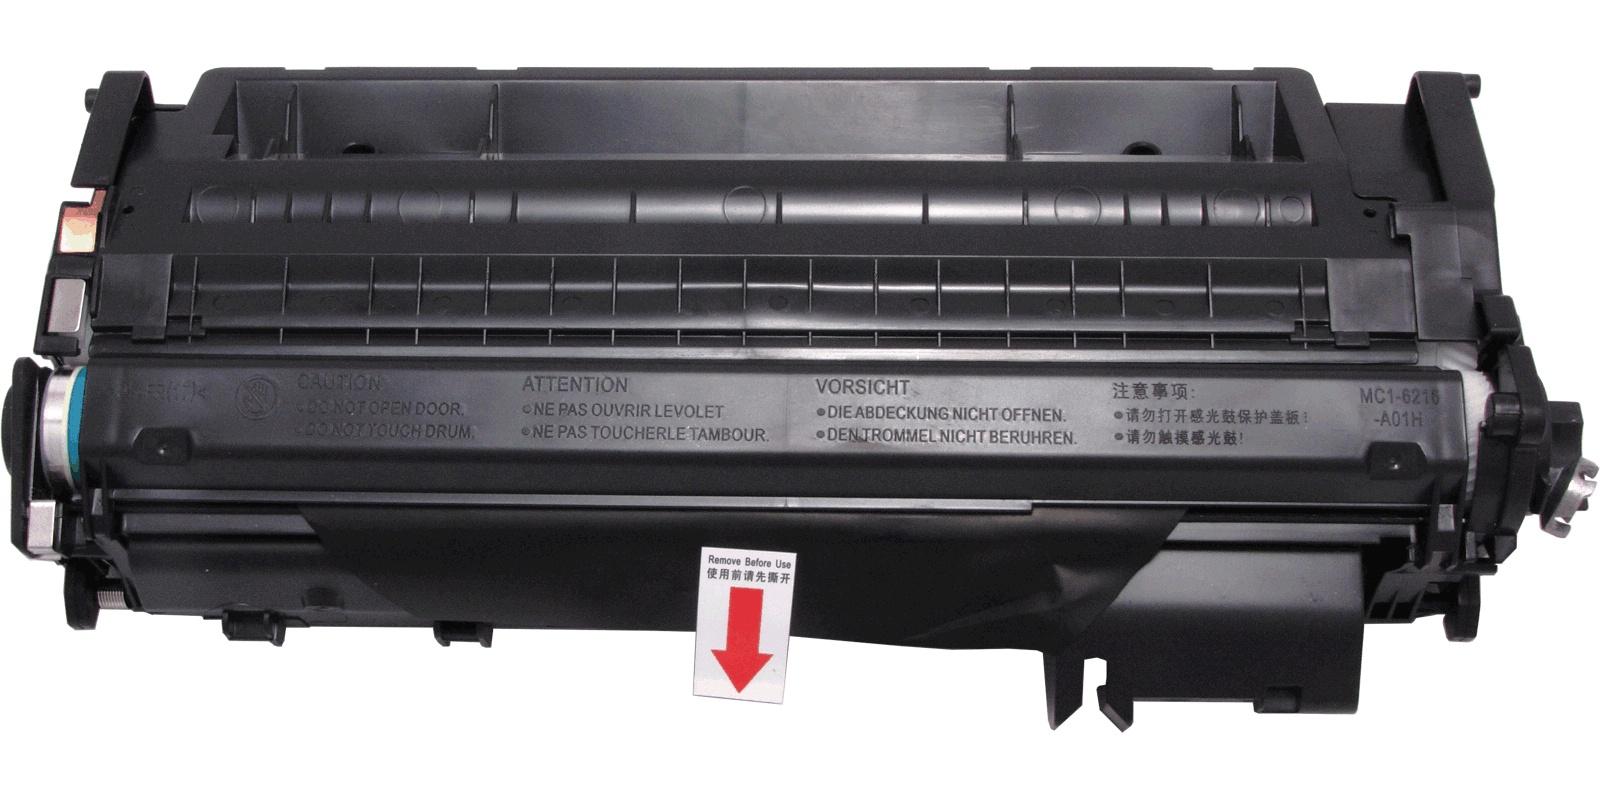 Картридж лазерный MAK №80A/№05A CF280A/CE505A черный (black), до 2300 стр. цена и фото